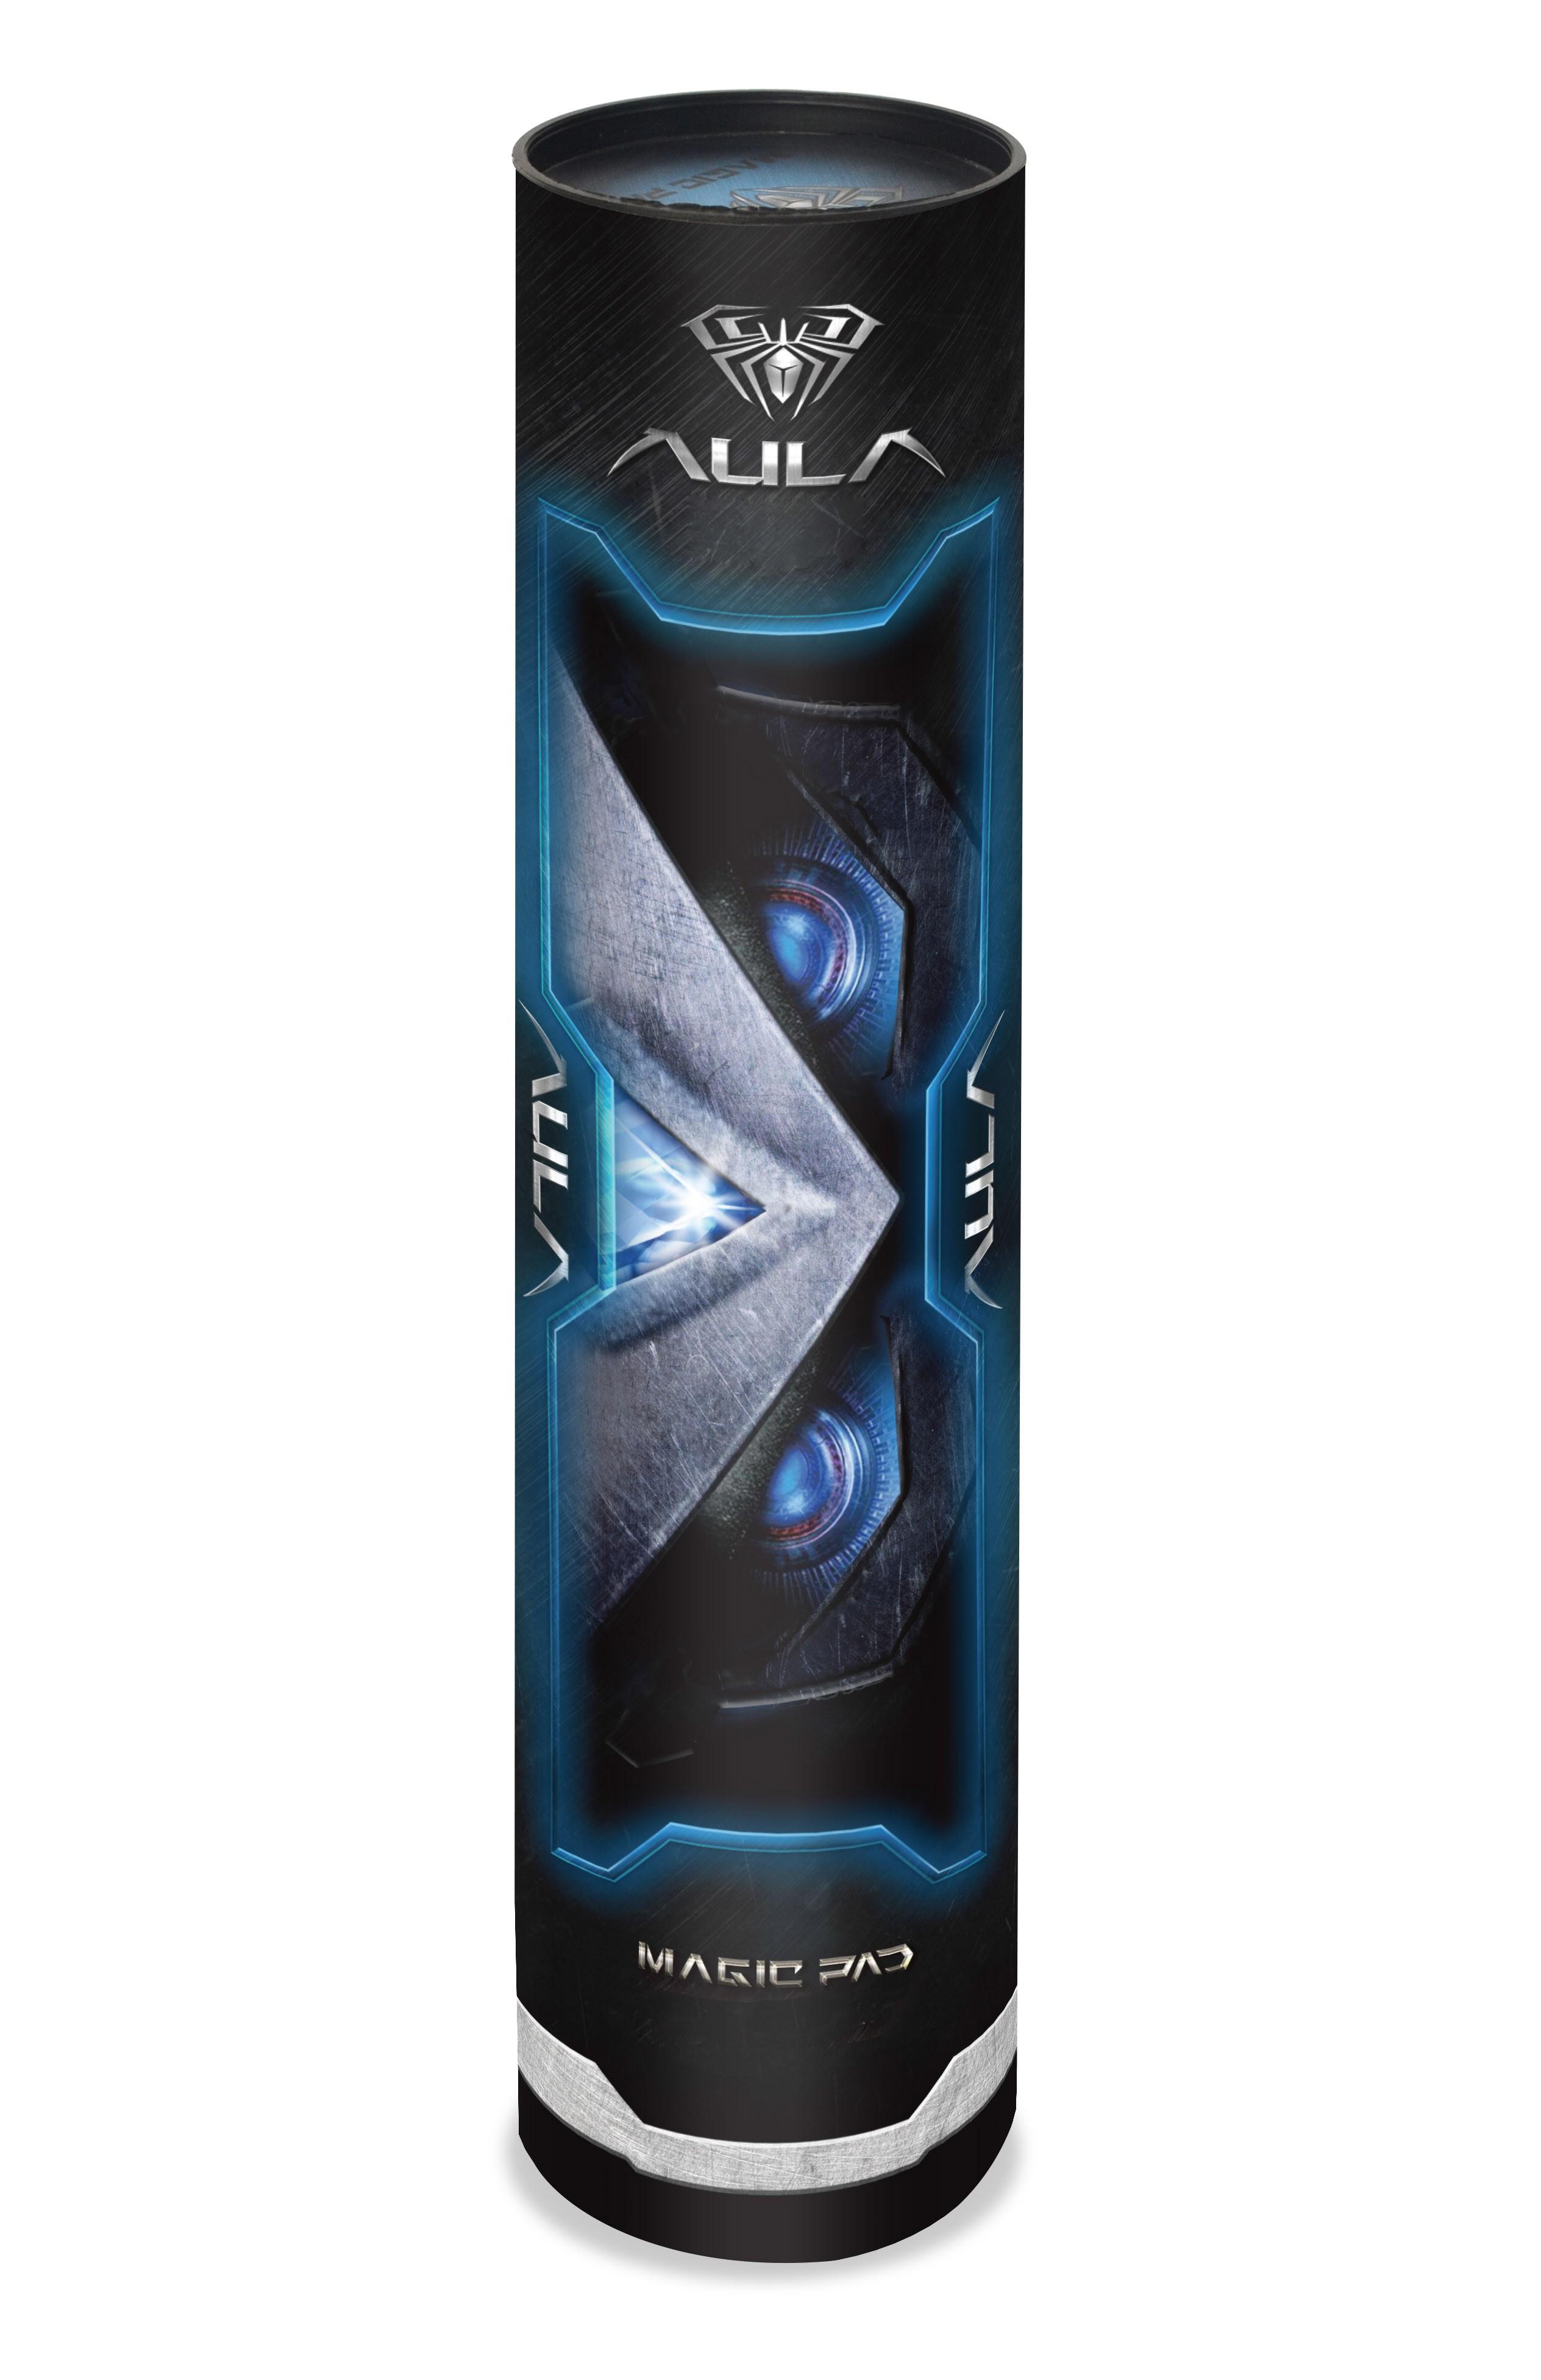 AULA Magic pelės kilimėlis 400x320x3mm